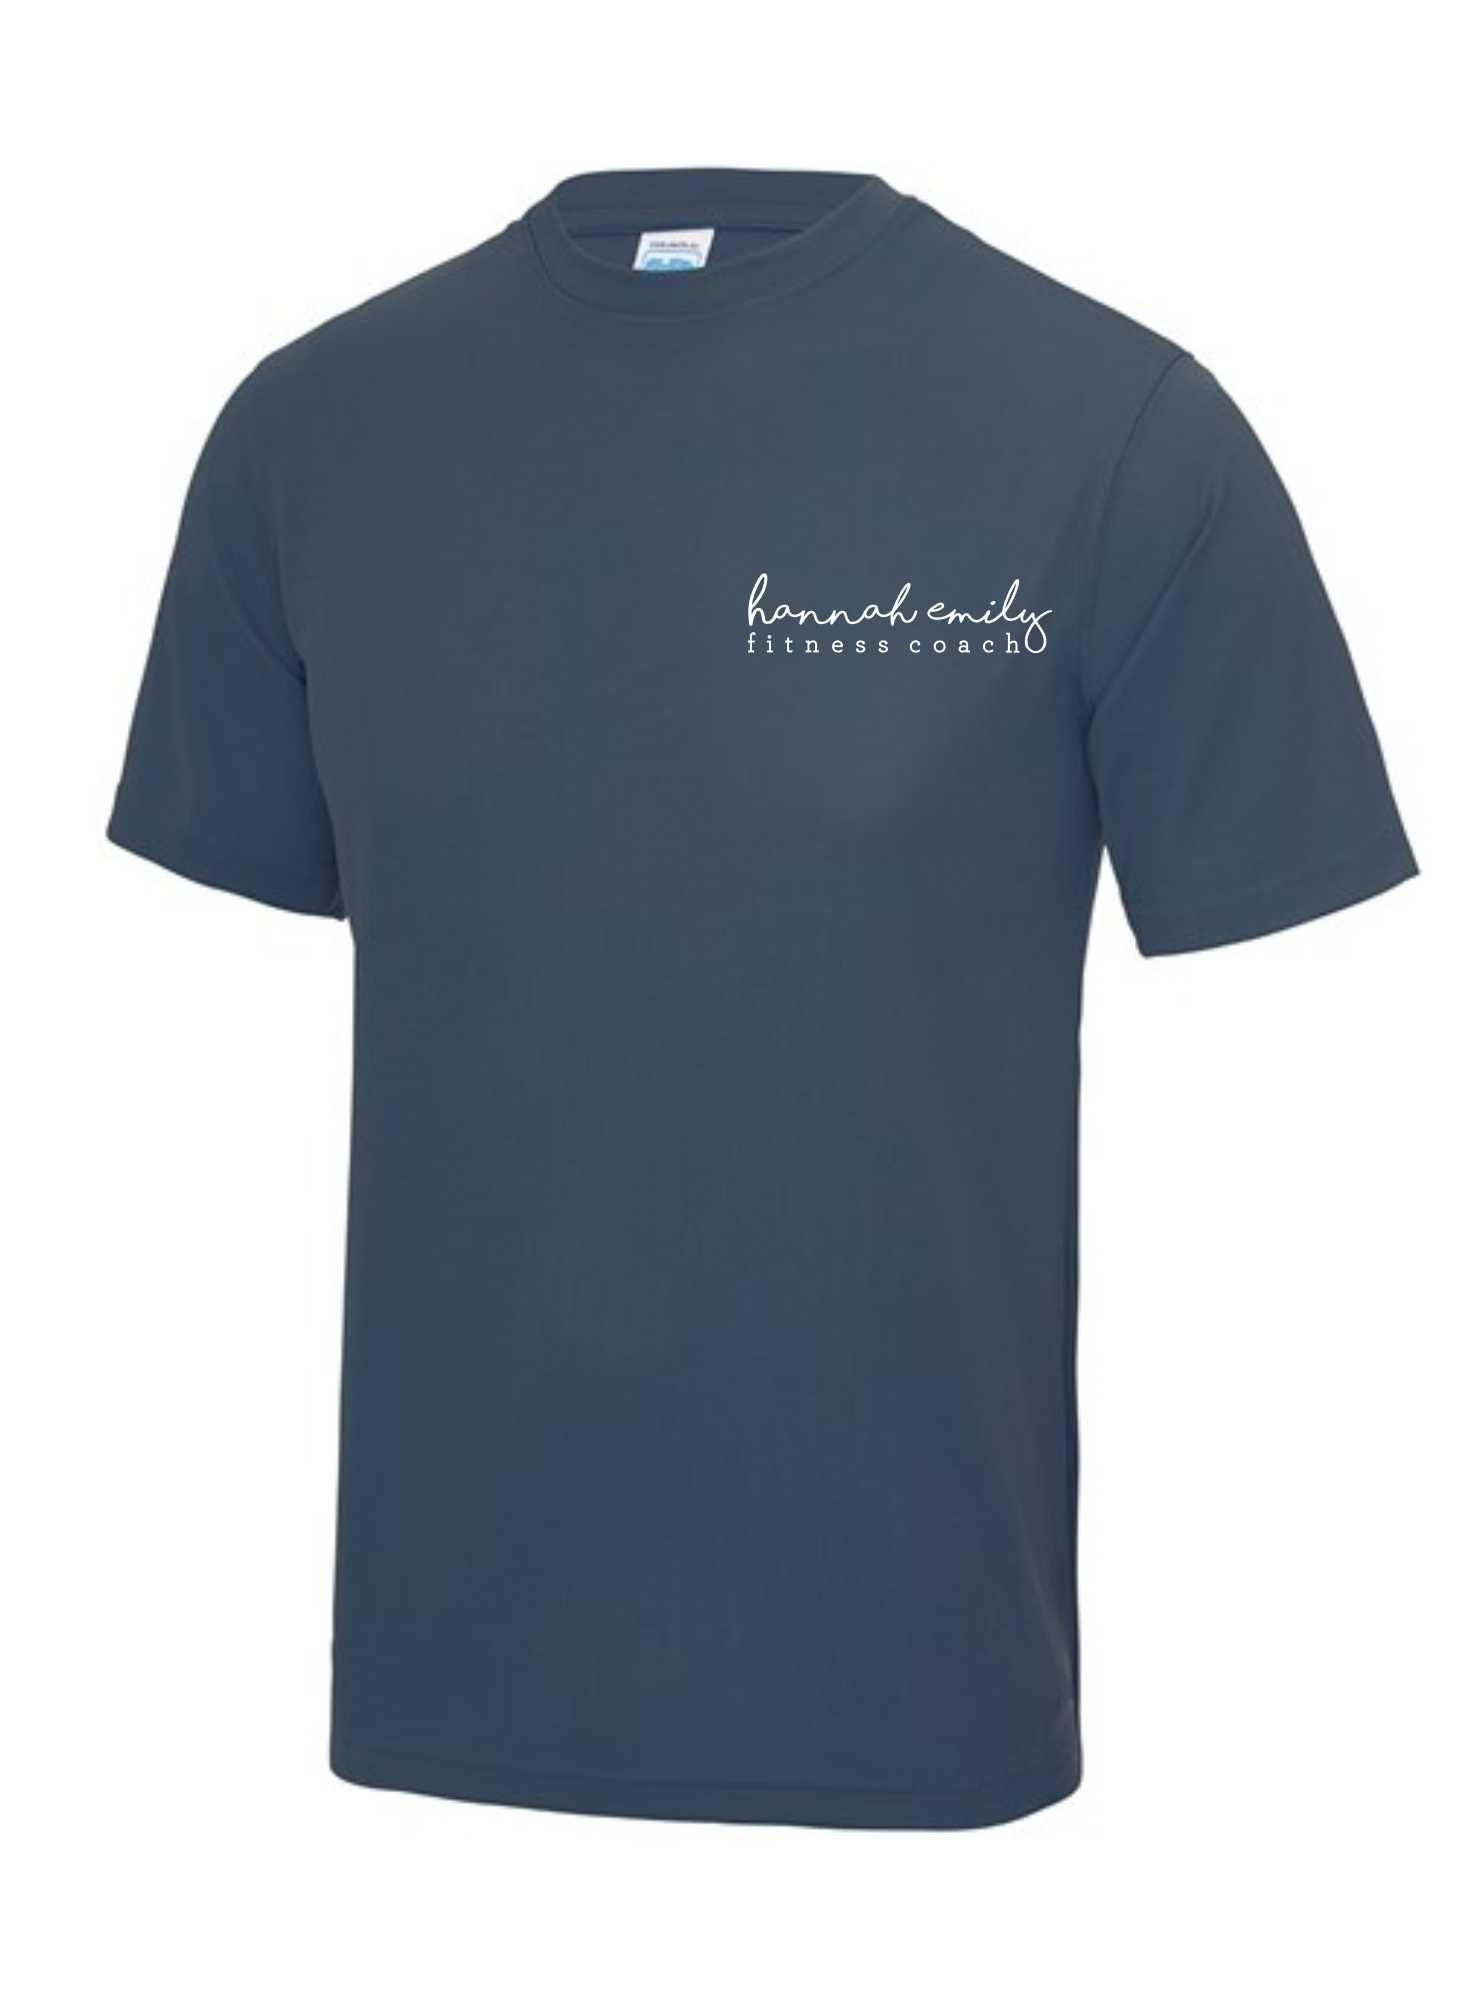 Hannah Emily Fitness- Sports T-Shirt